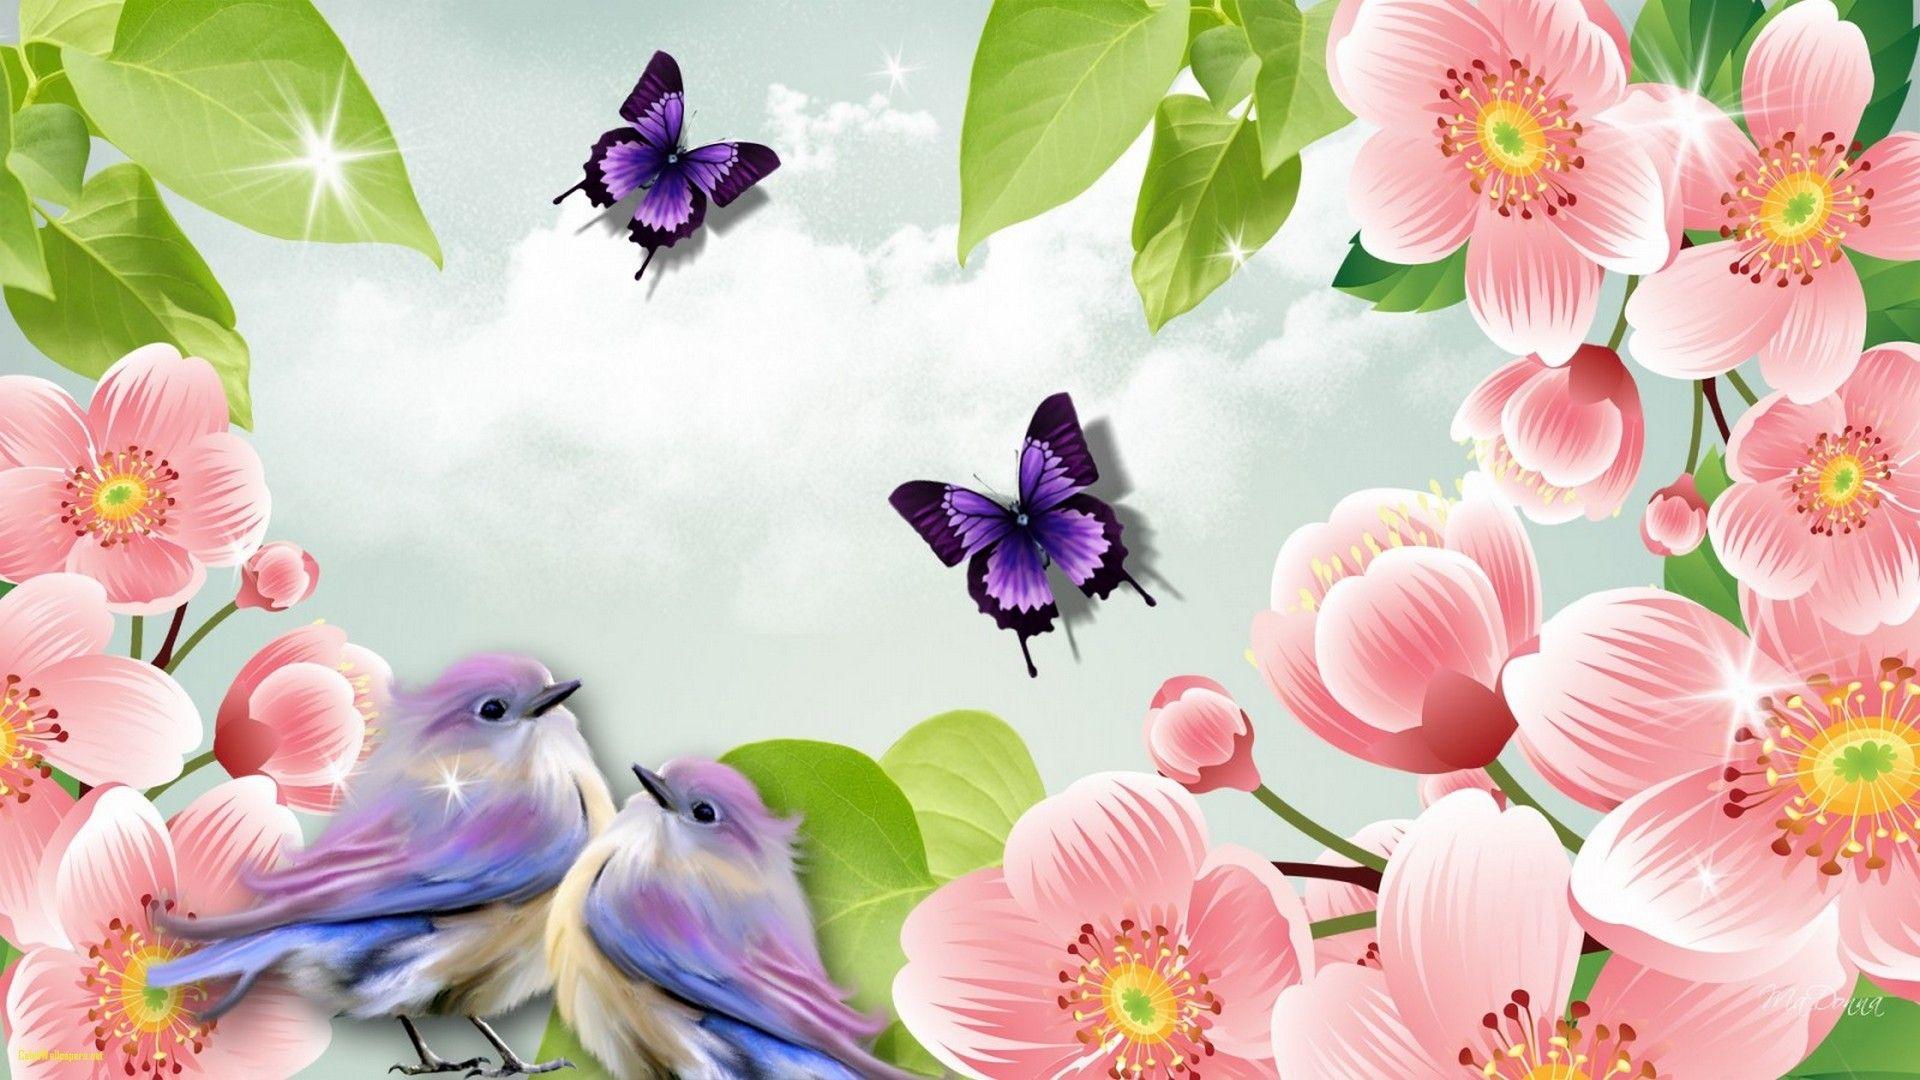 Wallpaper Cute Spring HD 2021 Live Wallpaper HD Spring 1920x1080